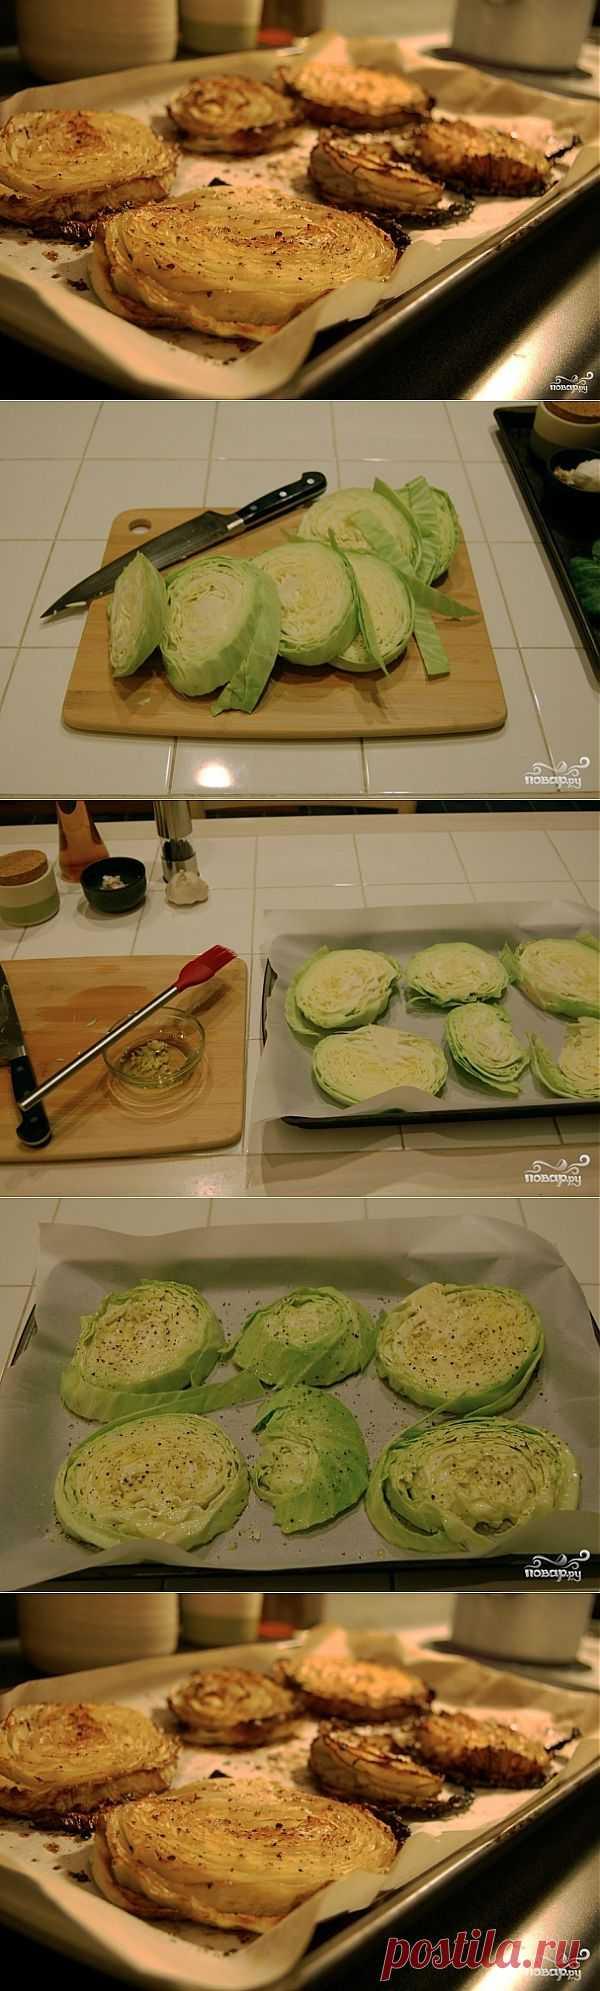 Запеченная капуста - пошаговый кулинарный рецепт на Повар.ру